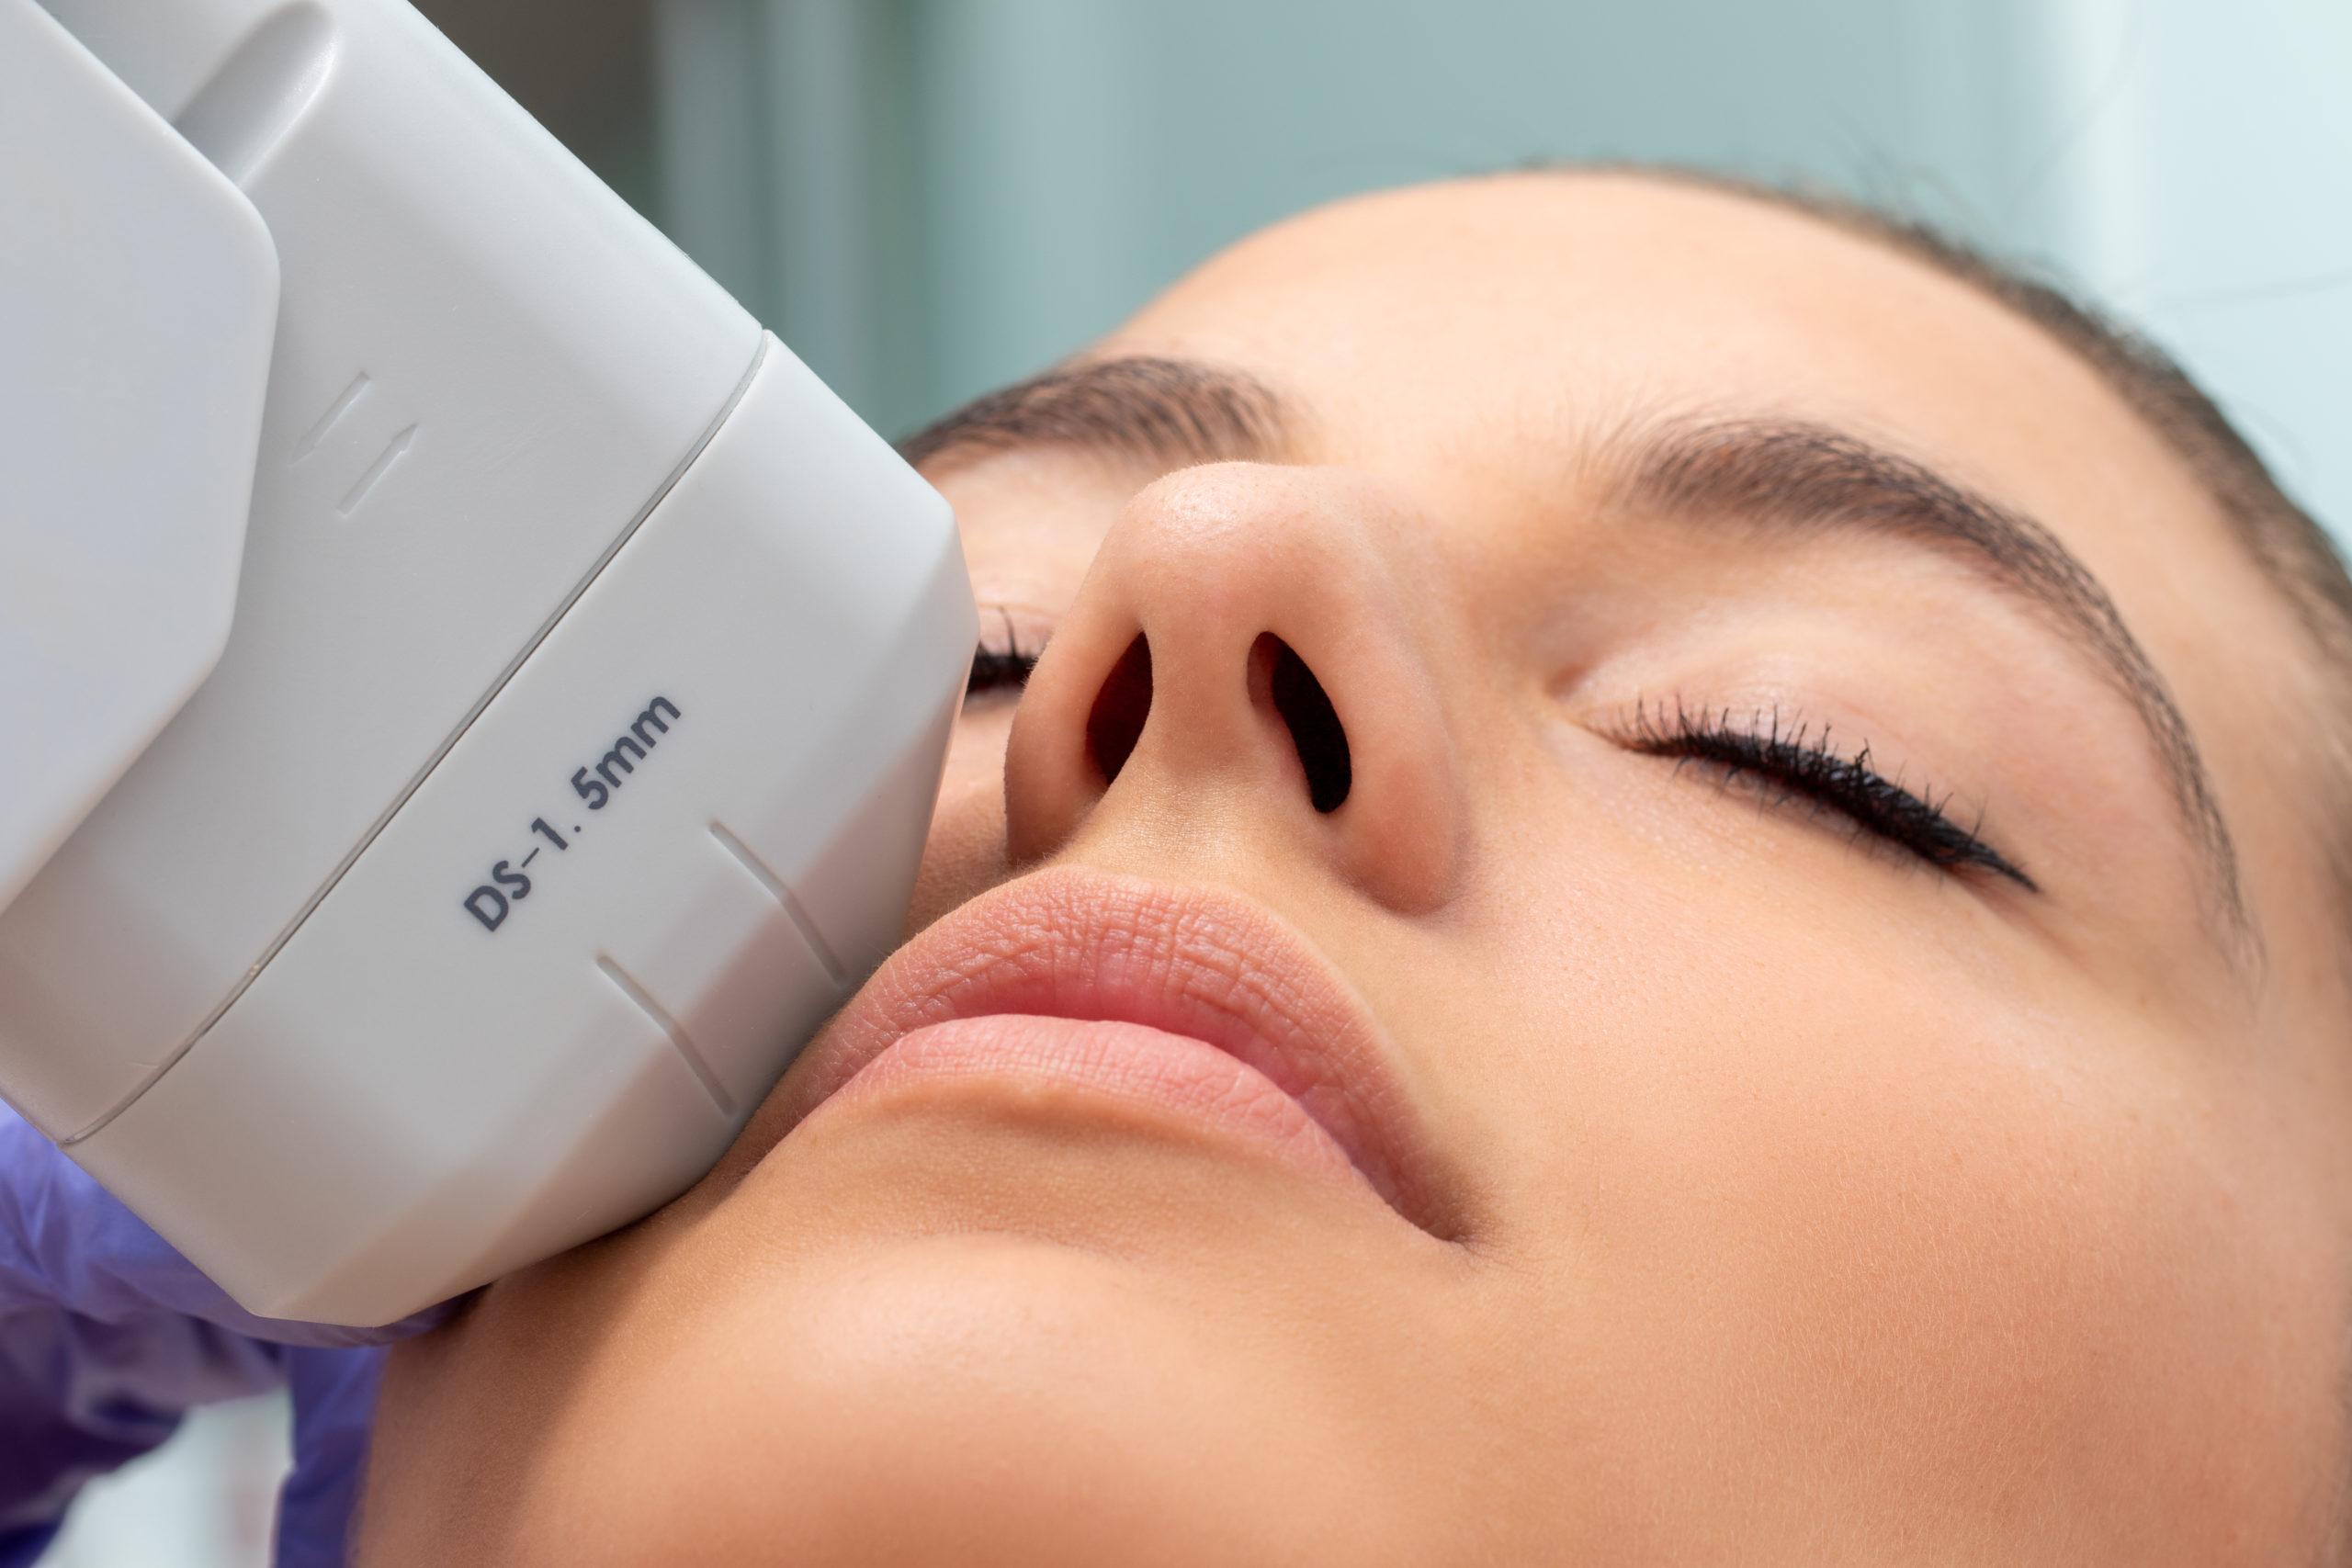 Extreme close up of HiFu treatment on face